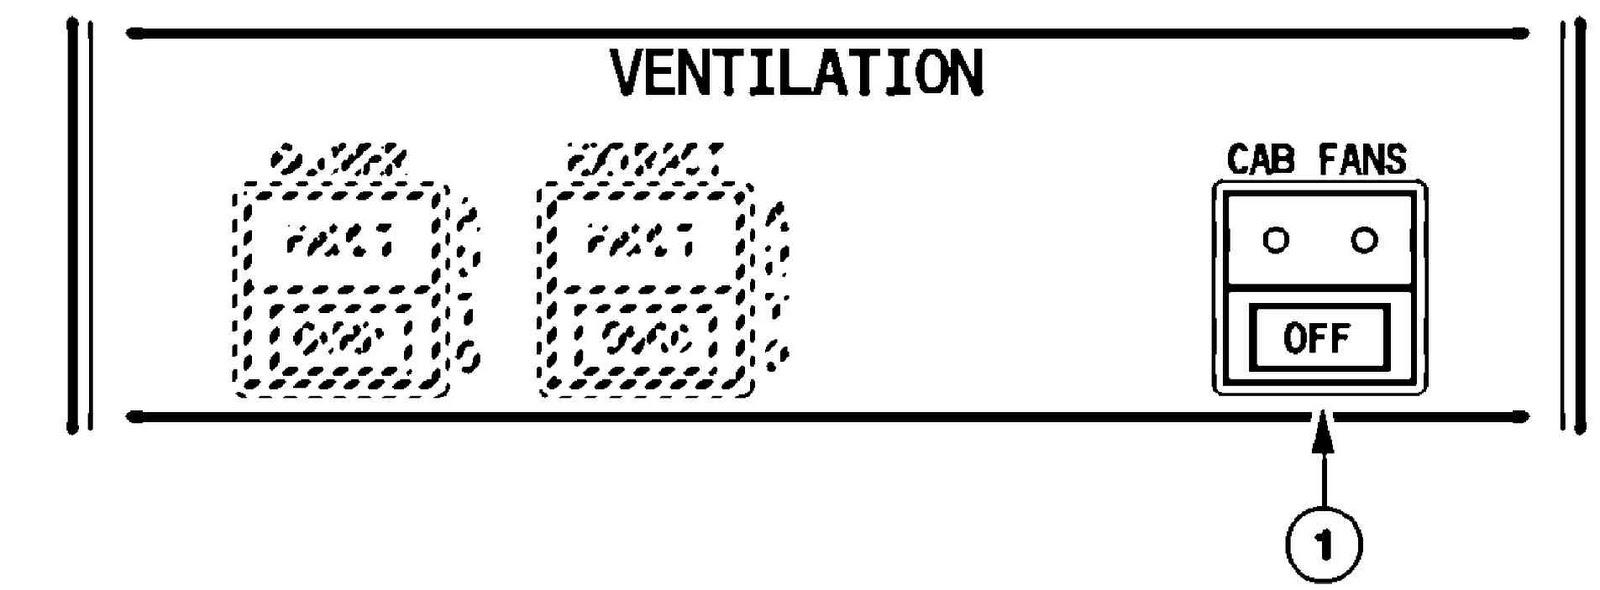 A320F technical description: AIR CONDITIONING